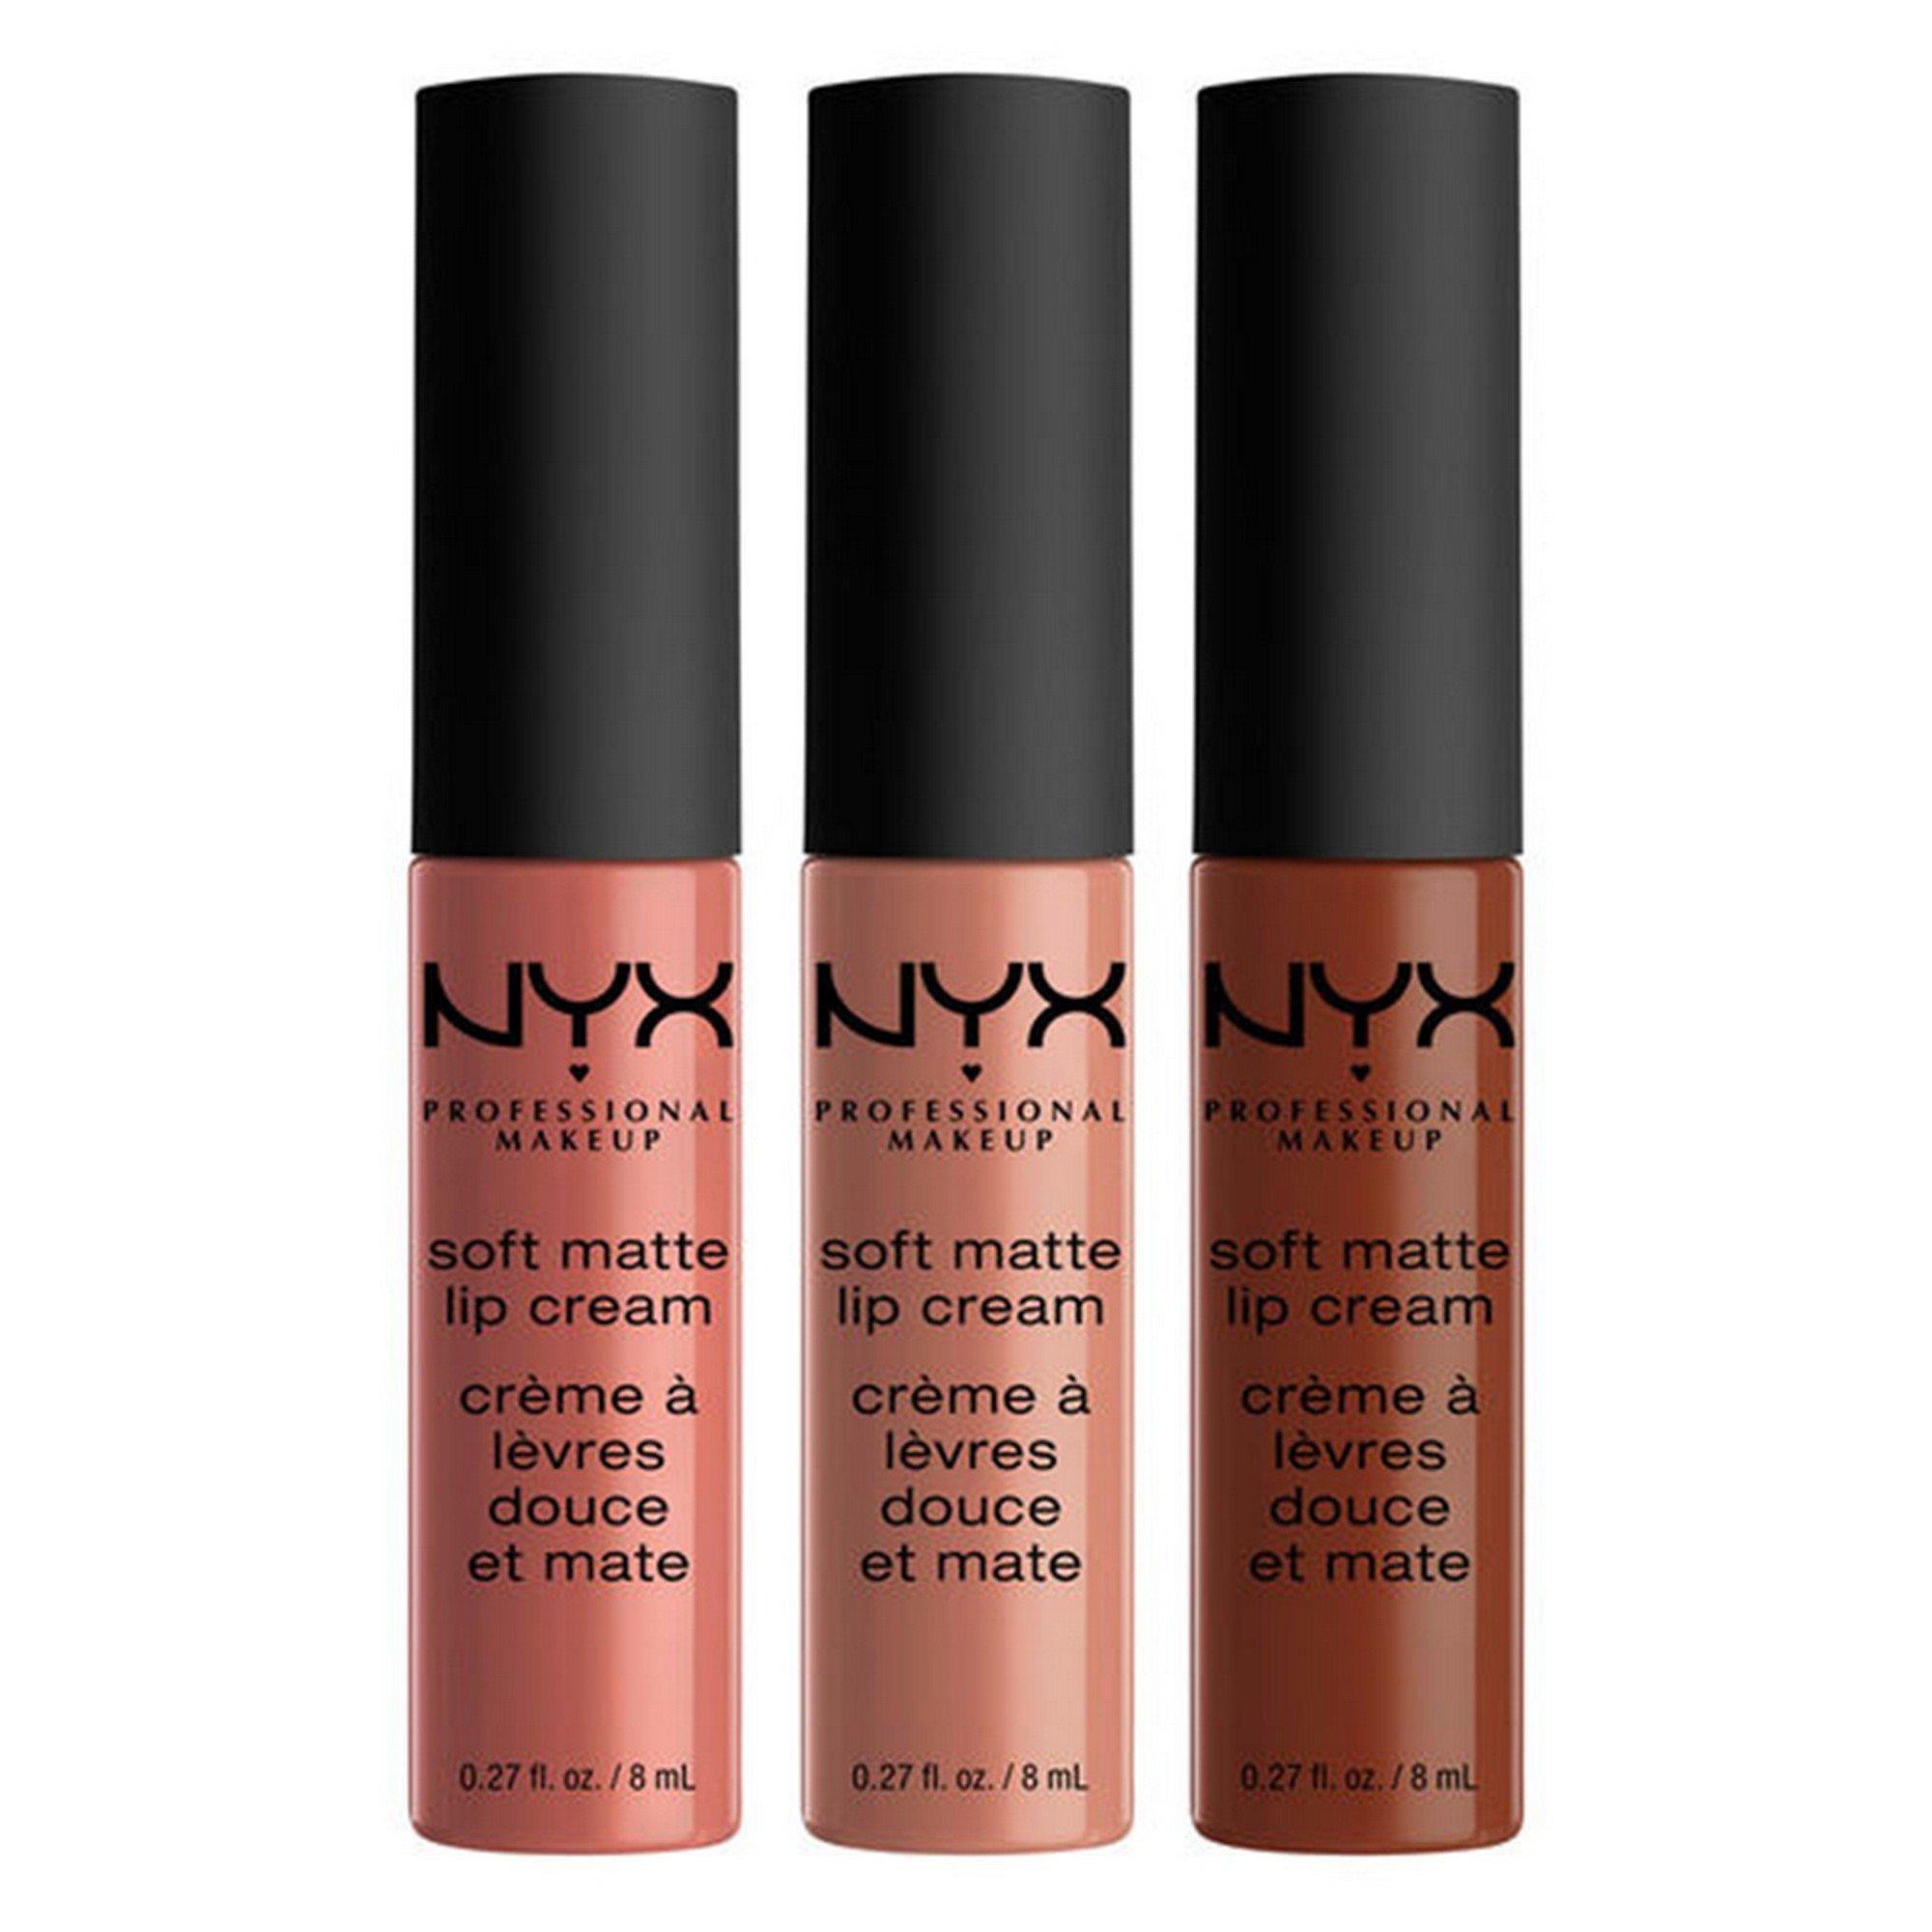 NYX PROFESSIONAL MAKEUP Soft Matte Lip Cream Set No. 13